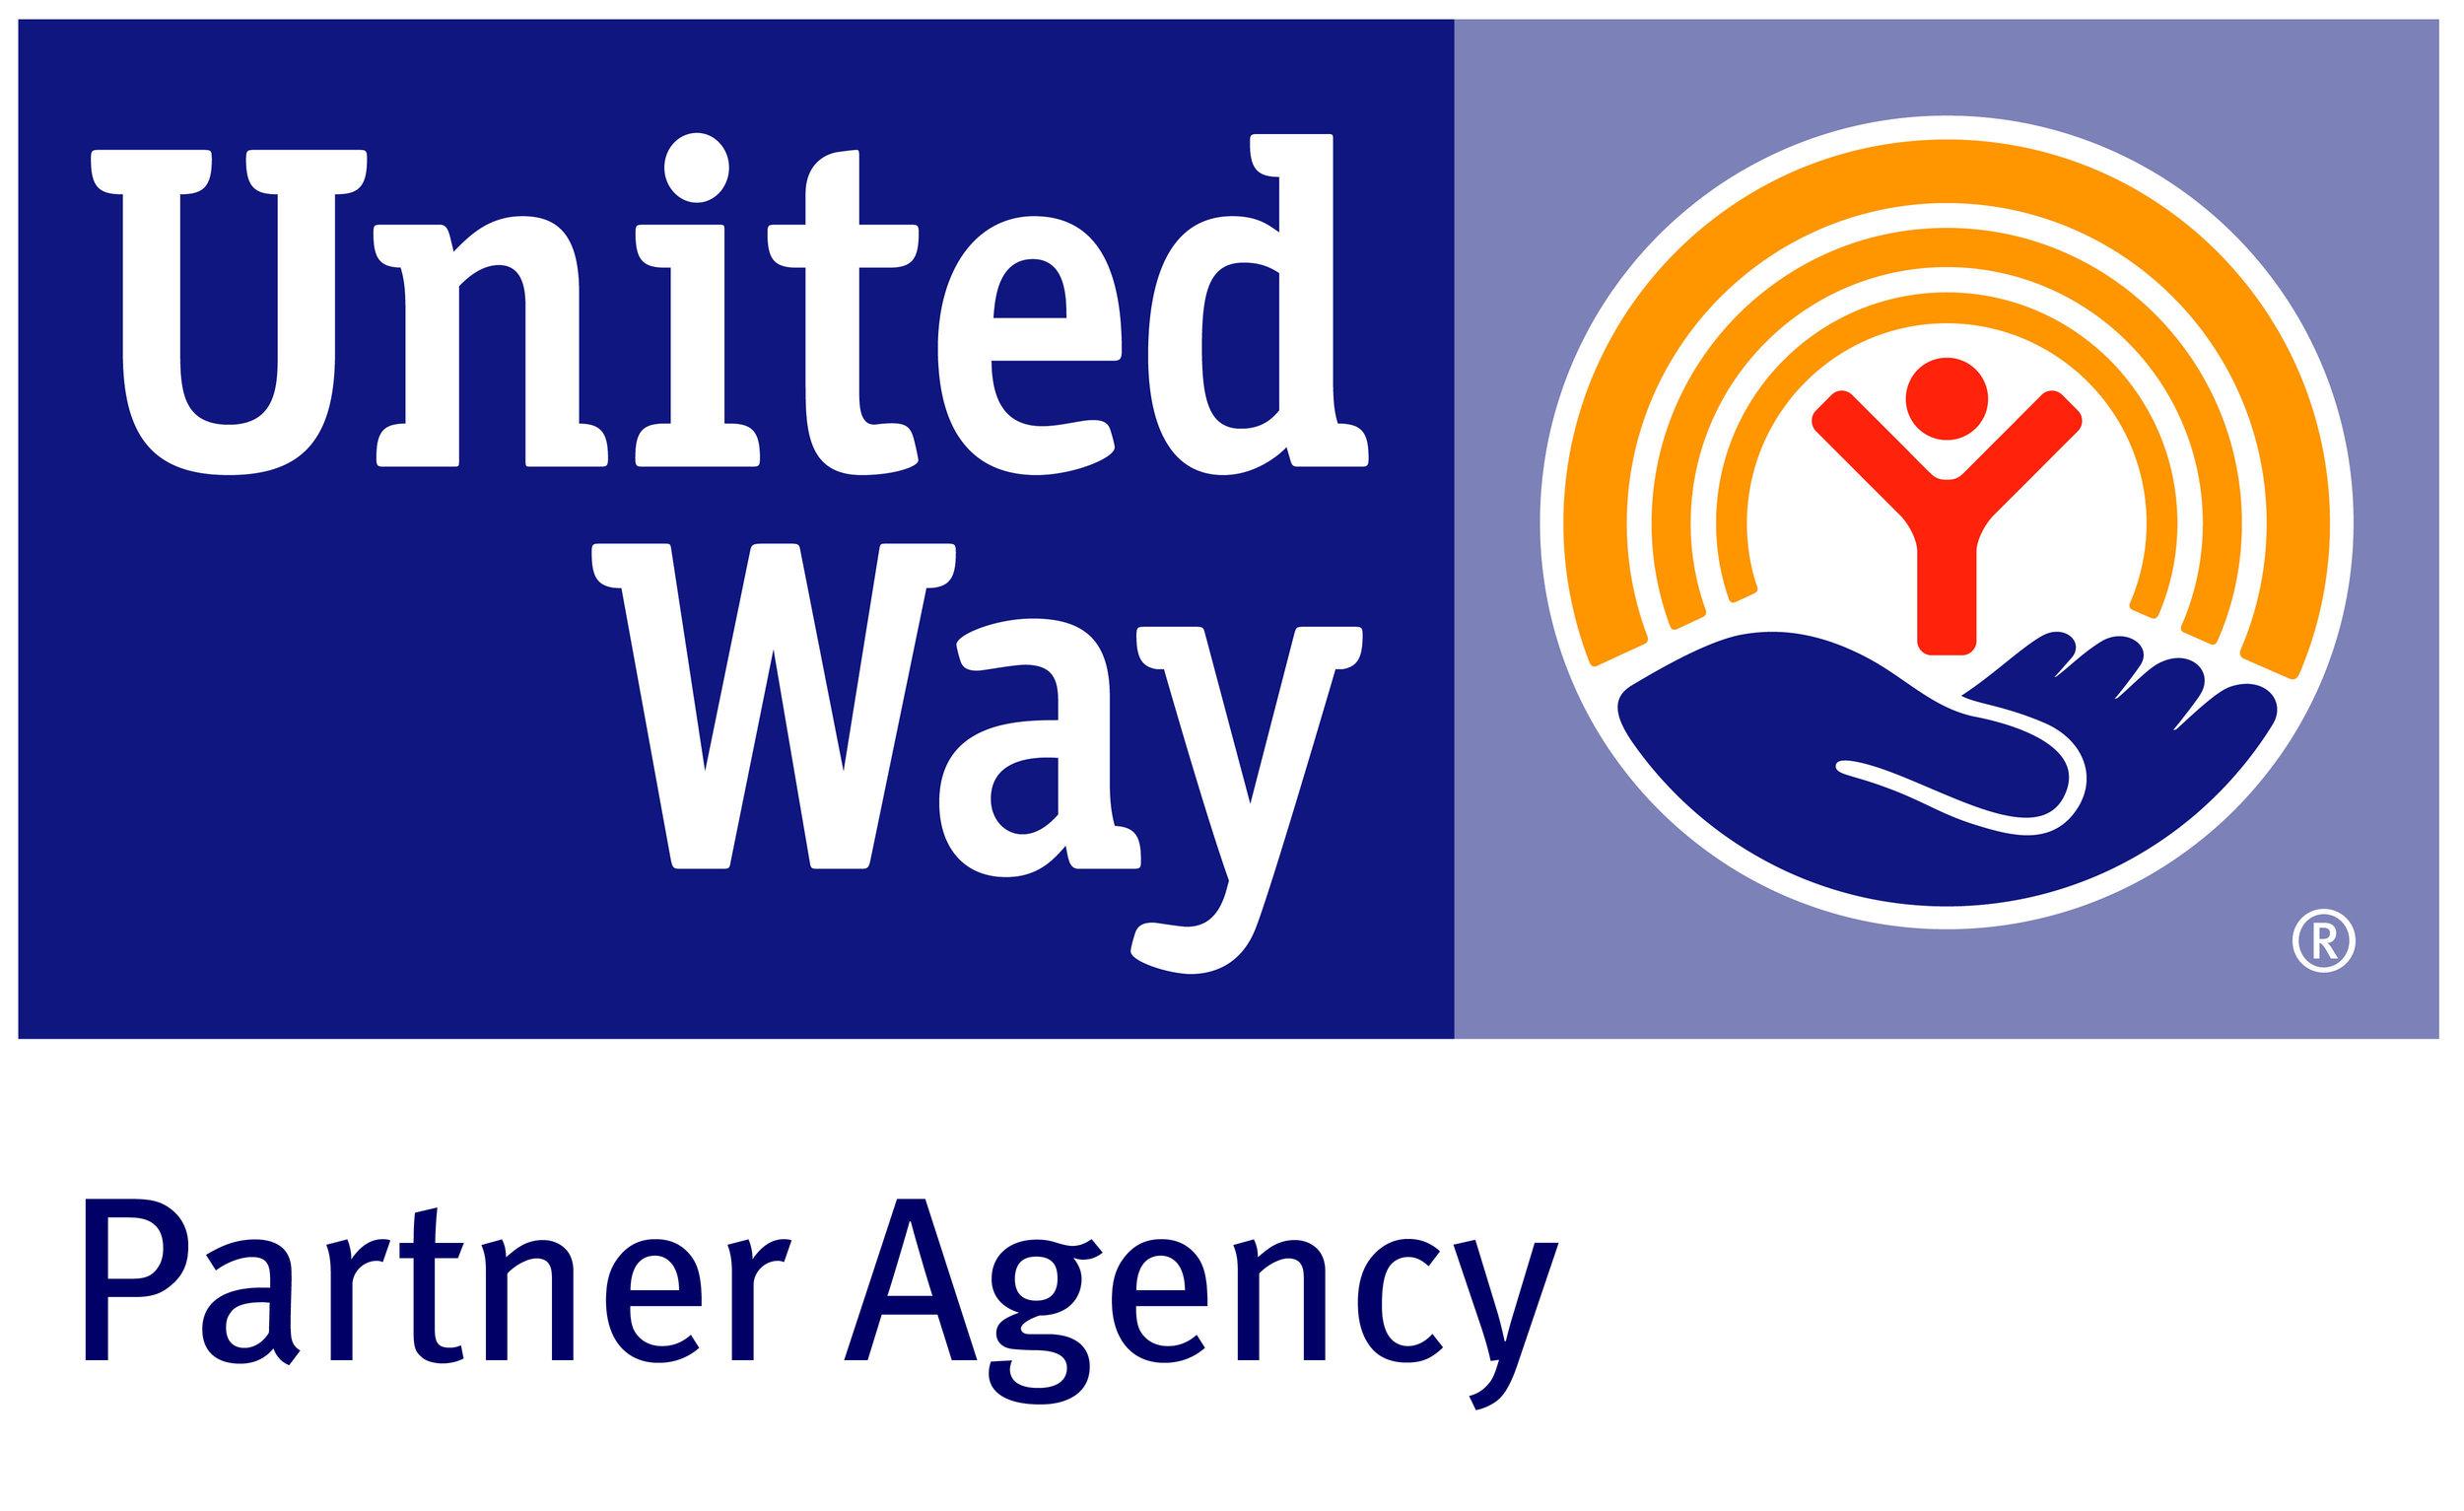 United-Way-Partner-Agency.jpg